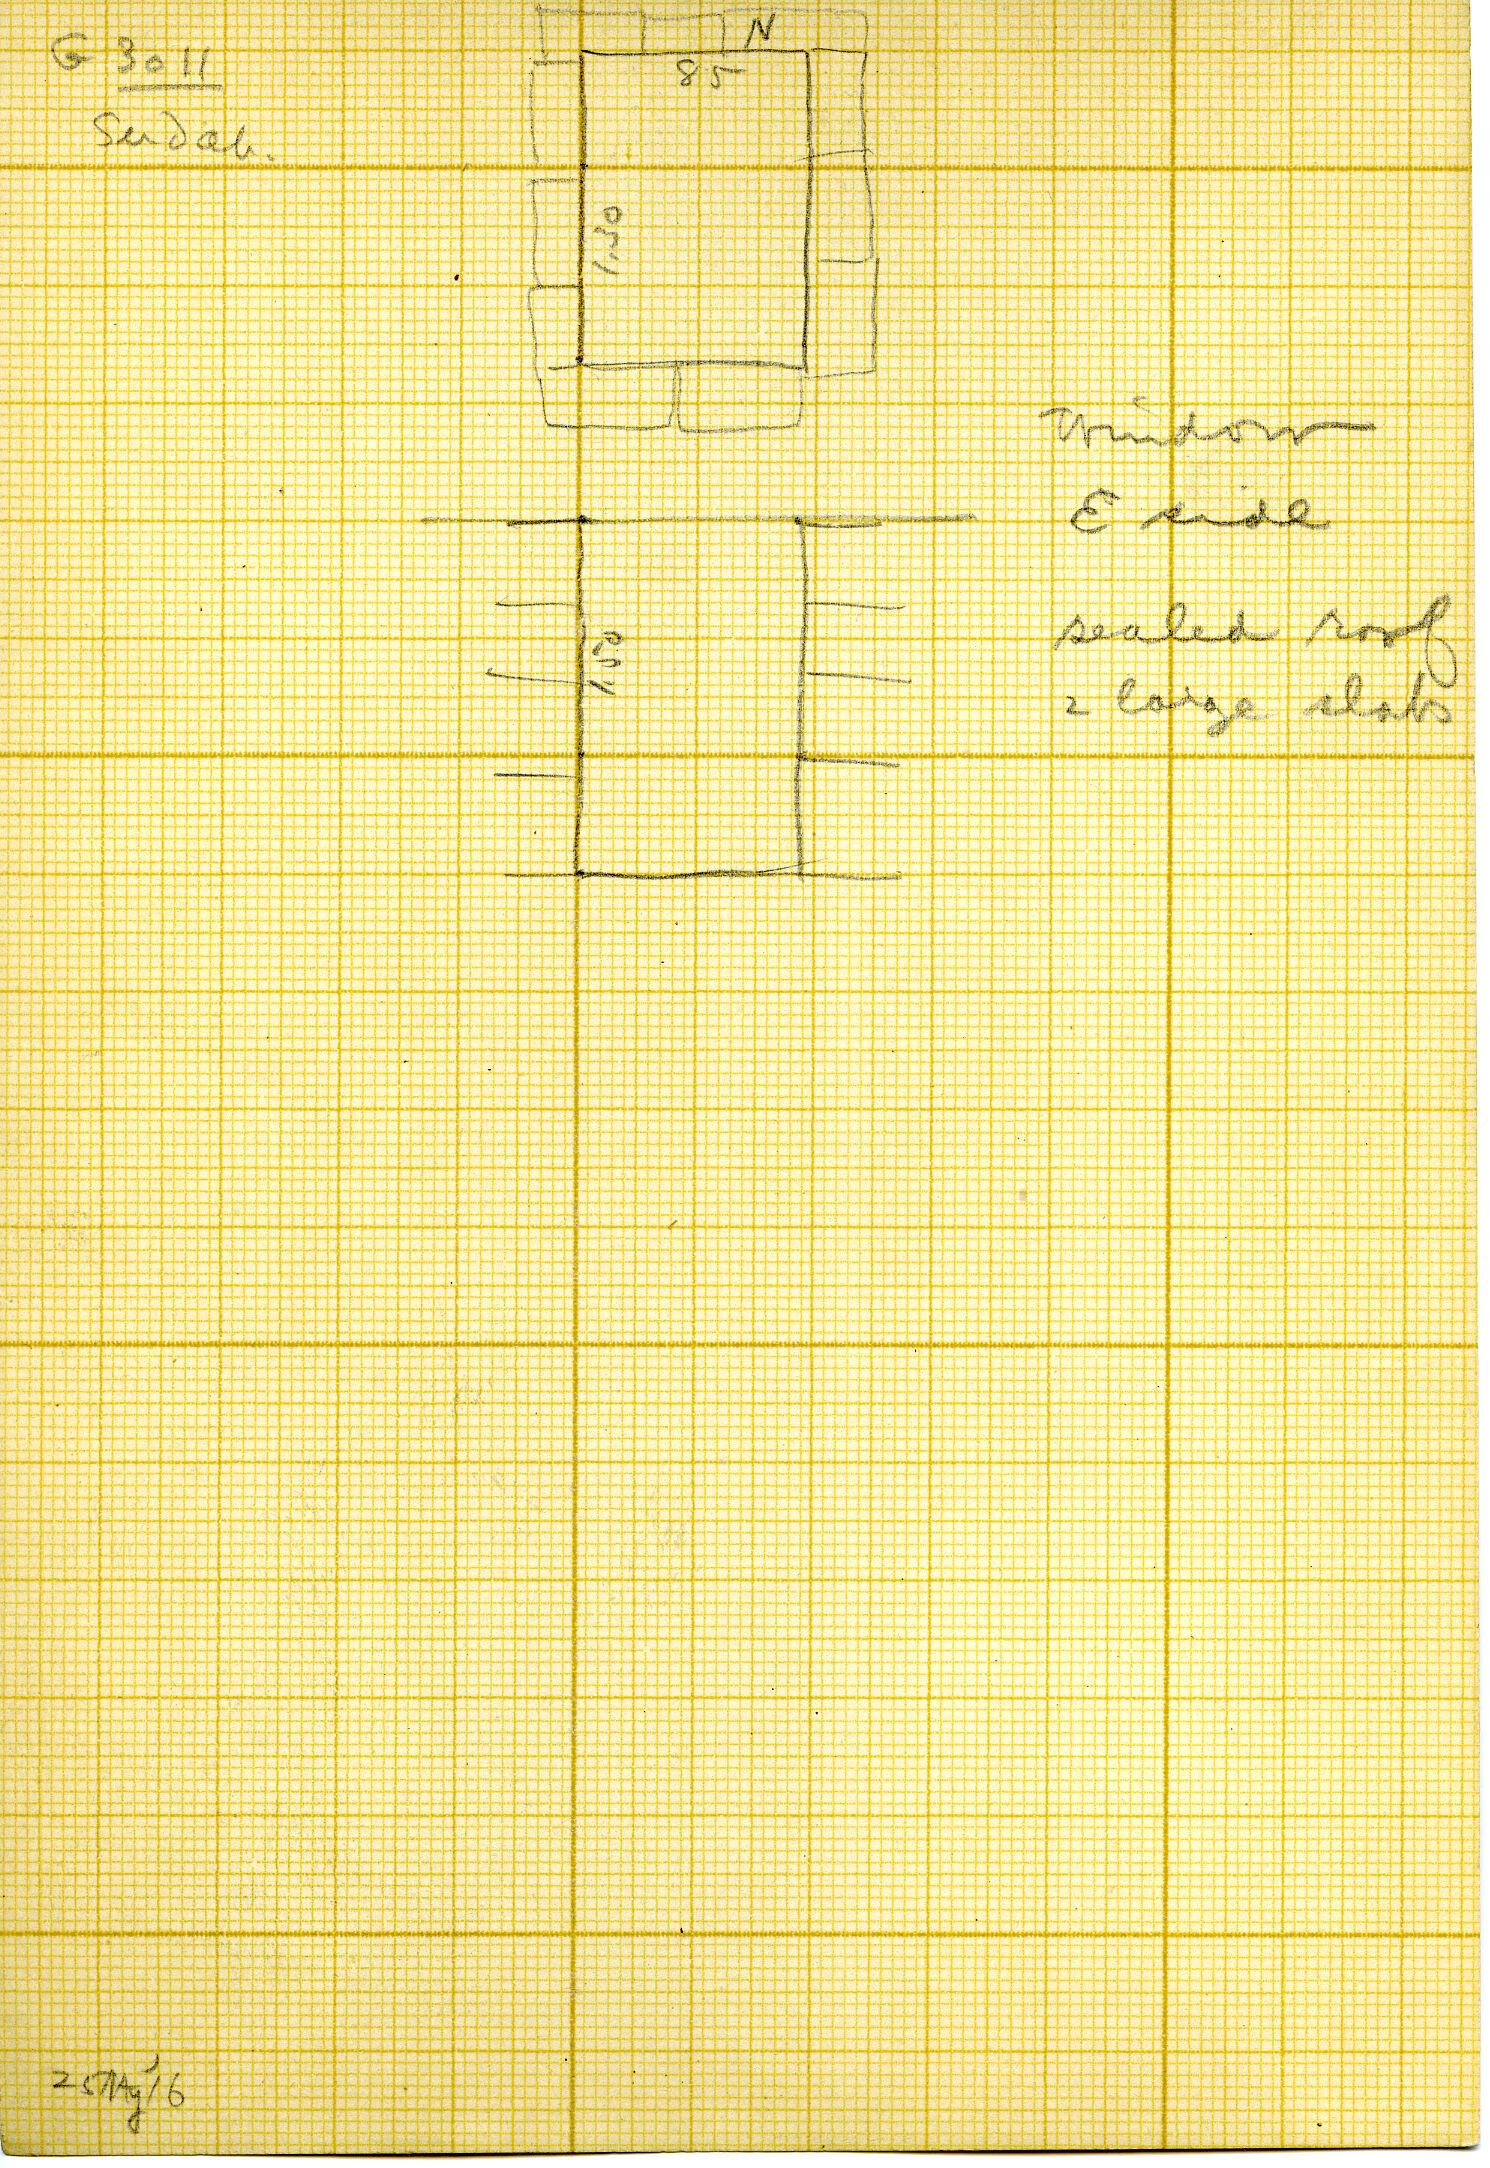 Maps and plans: G 3011, Serdab